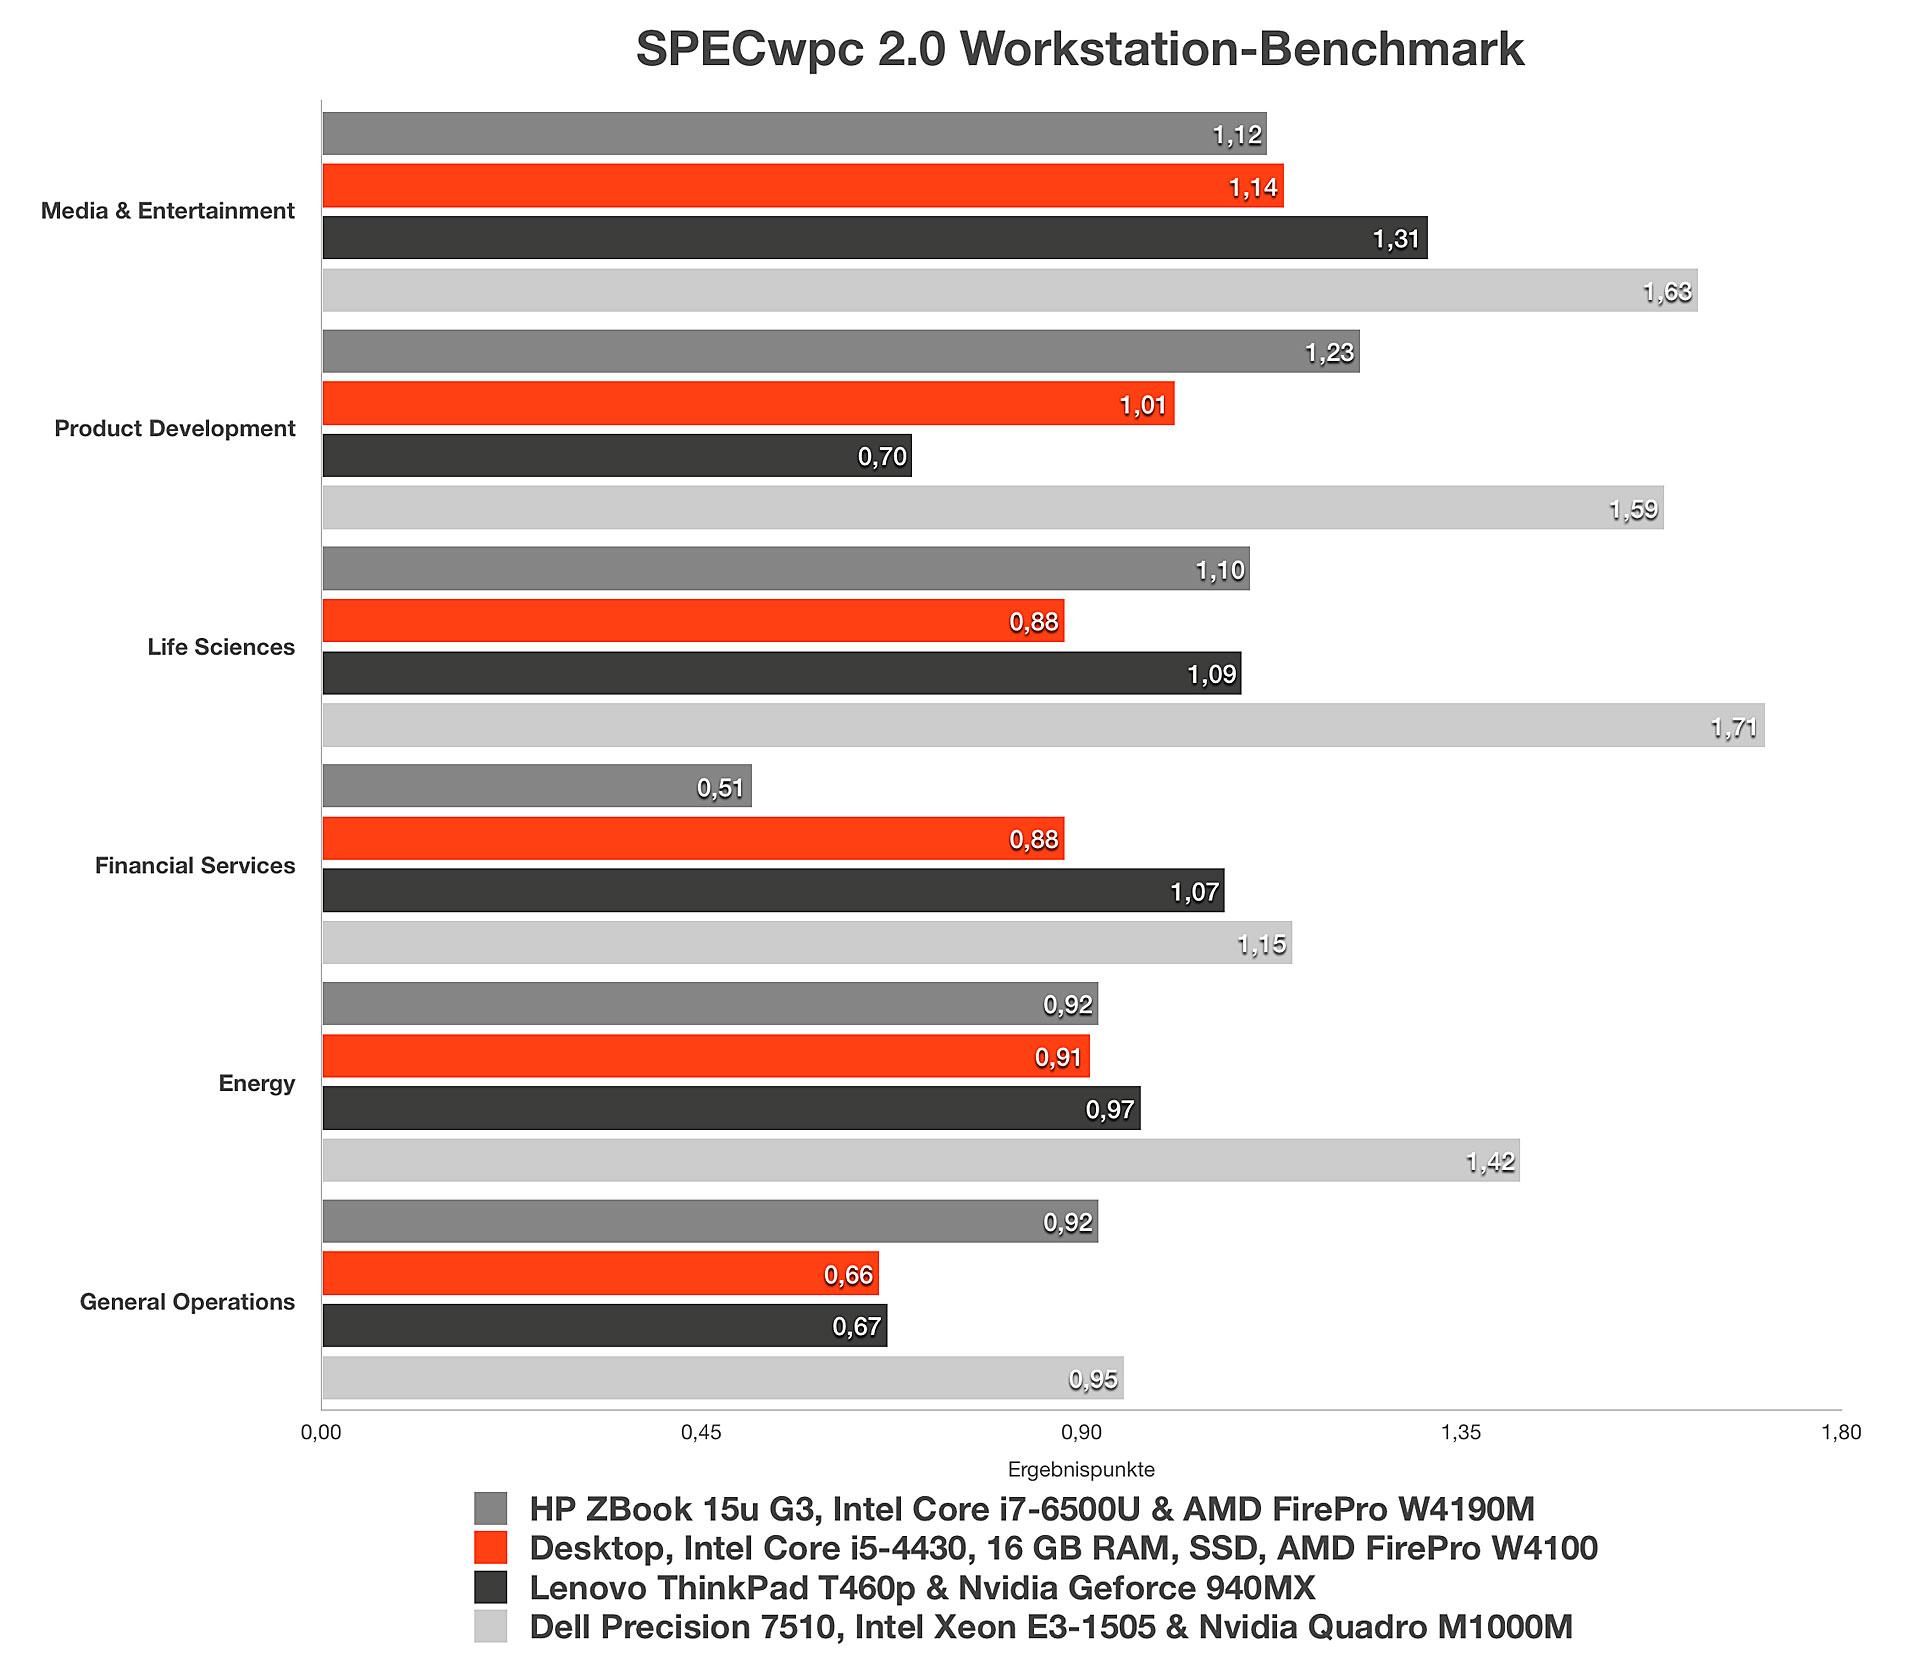 AMD FirePro W4100: SPECwpc